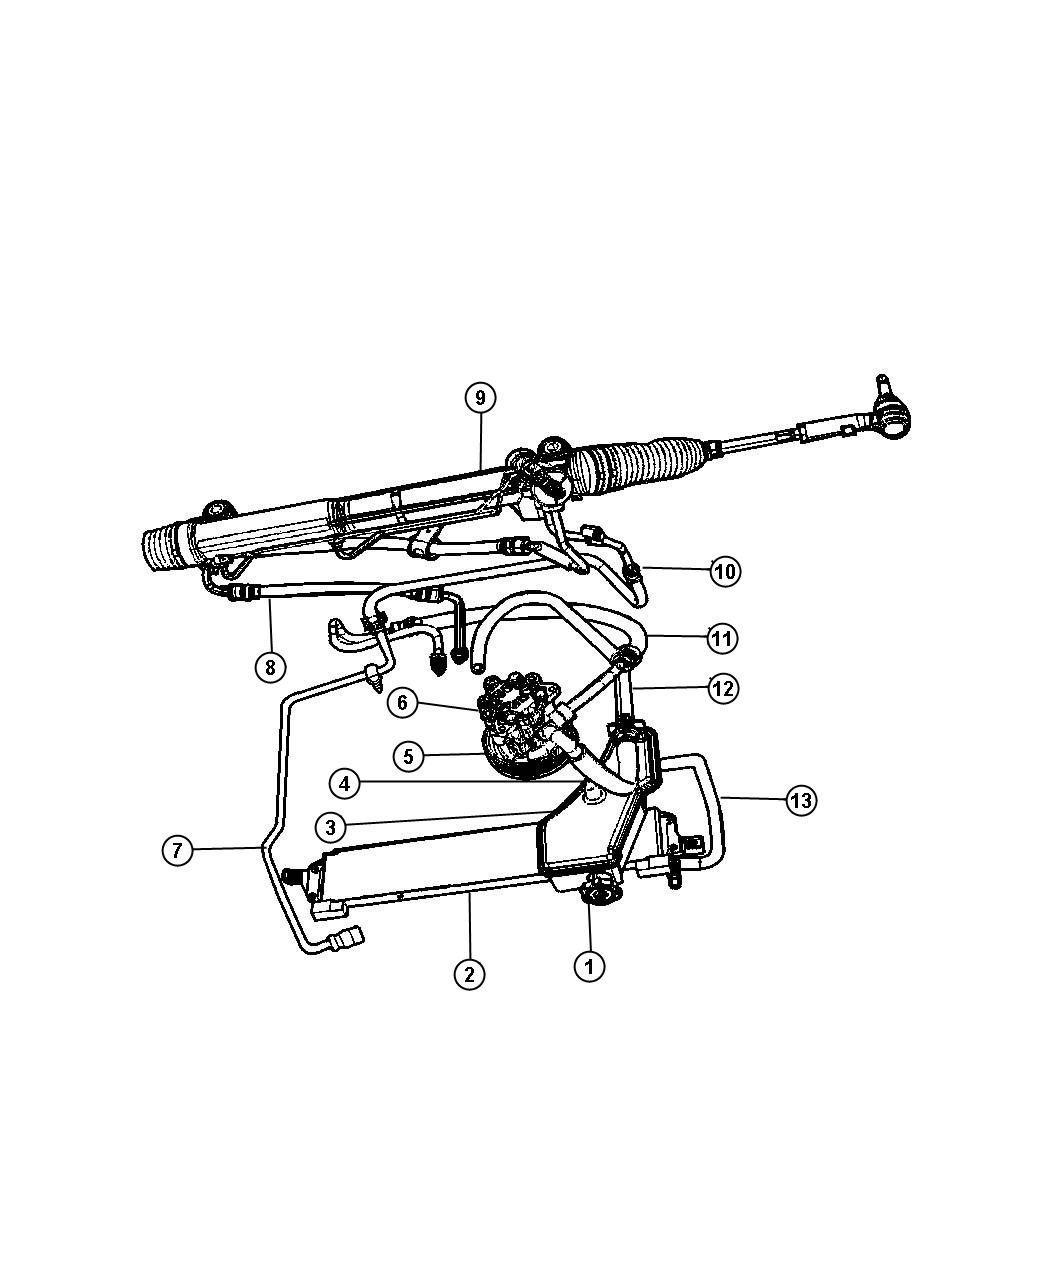 Jeep Commander Reservoir. Power steering fluid. [hydraulic